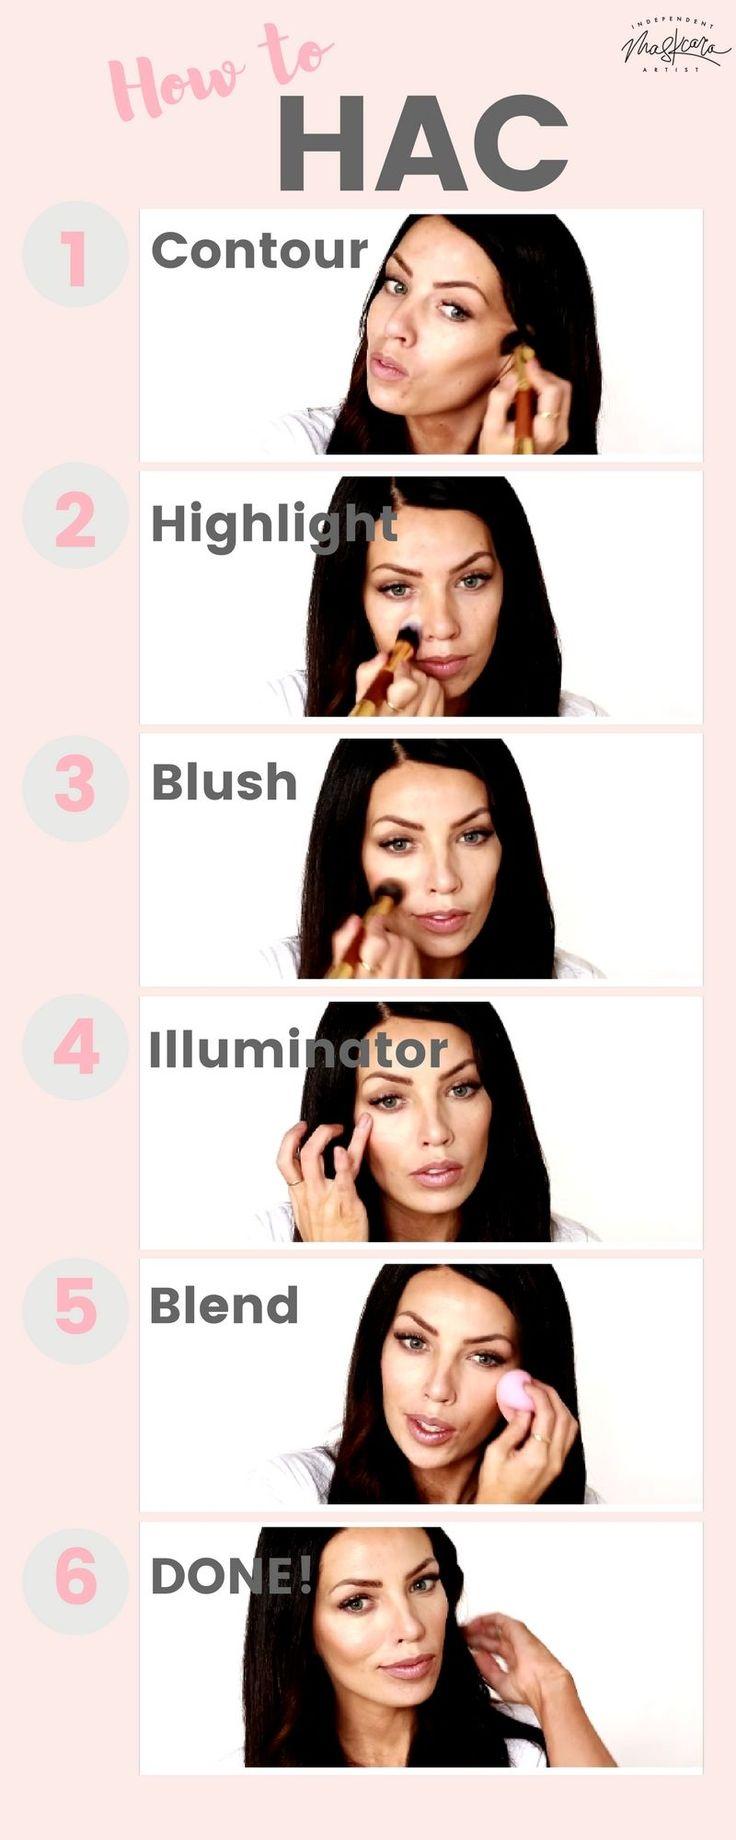 How to HAC  Maskcara Makeup Tutorial  How to Hightlight and Contour